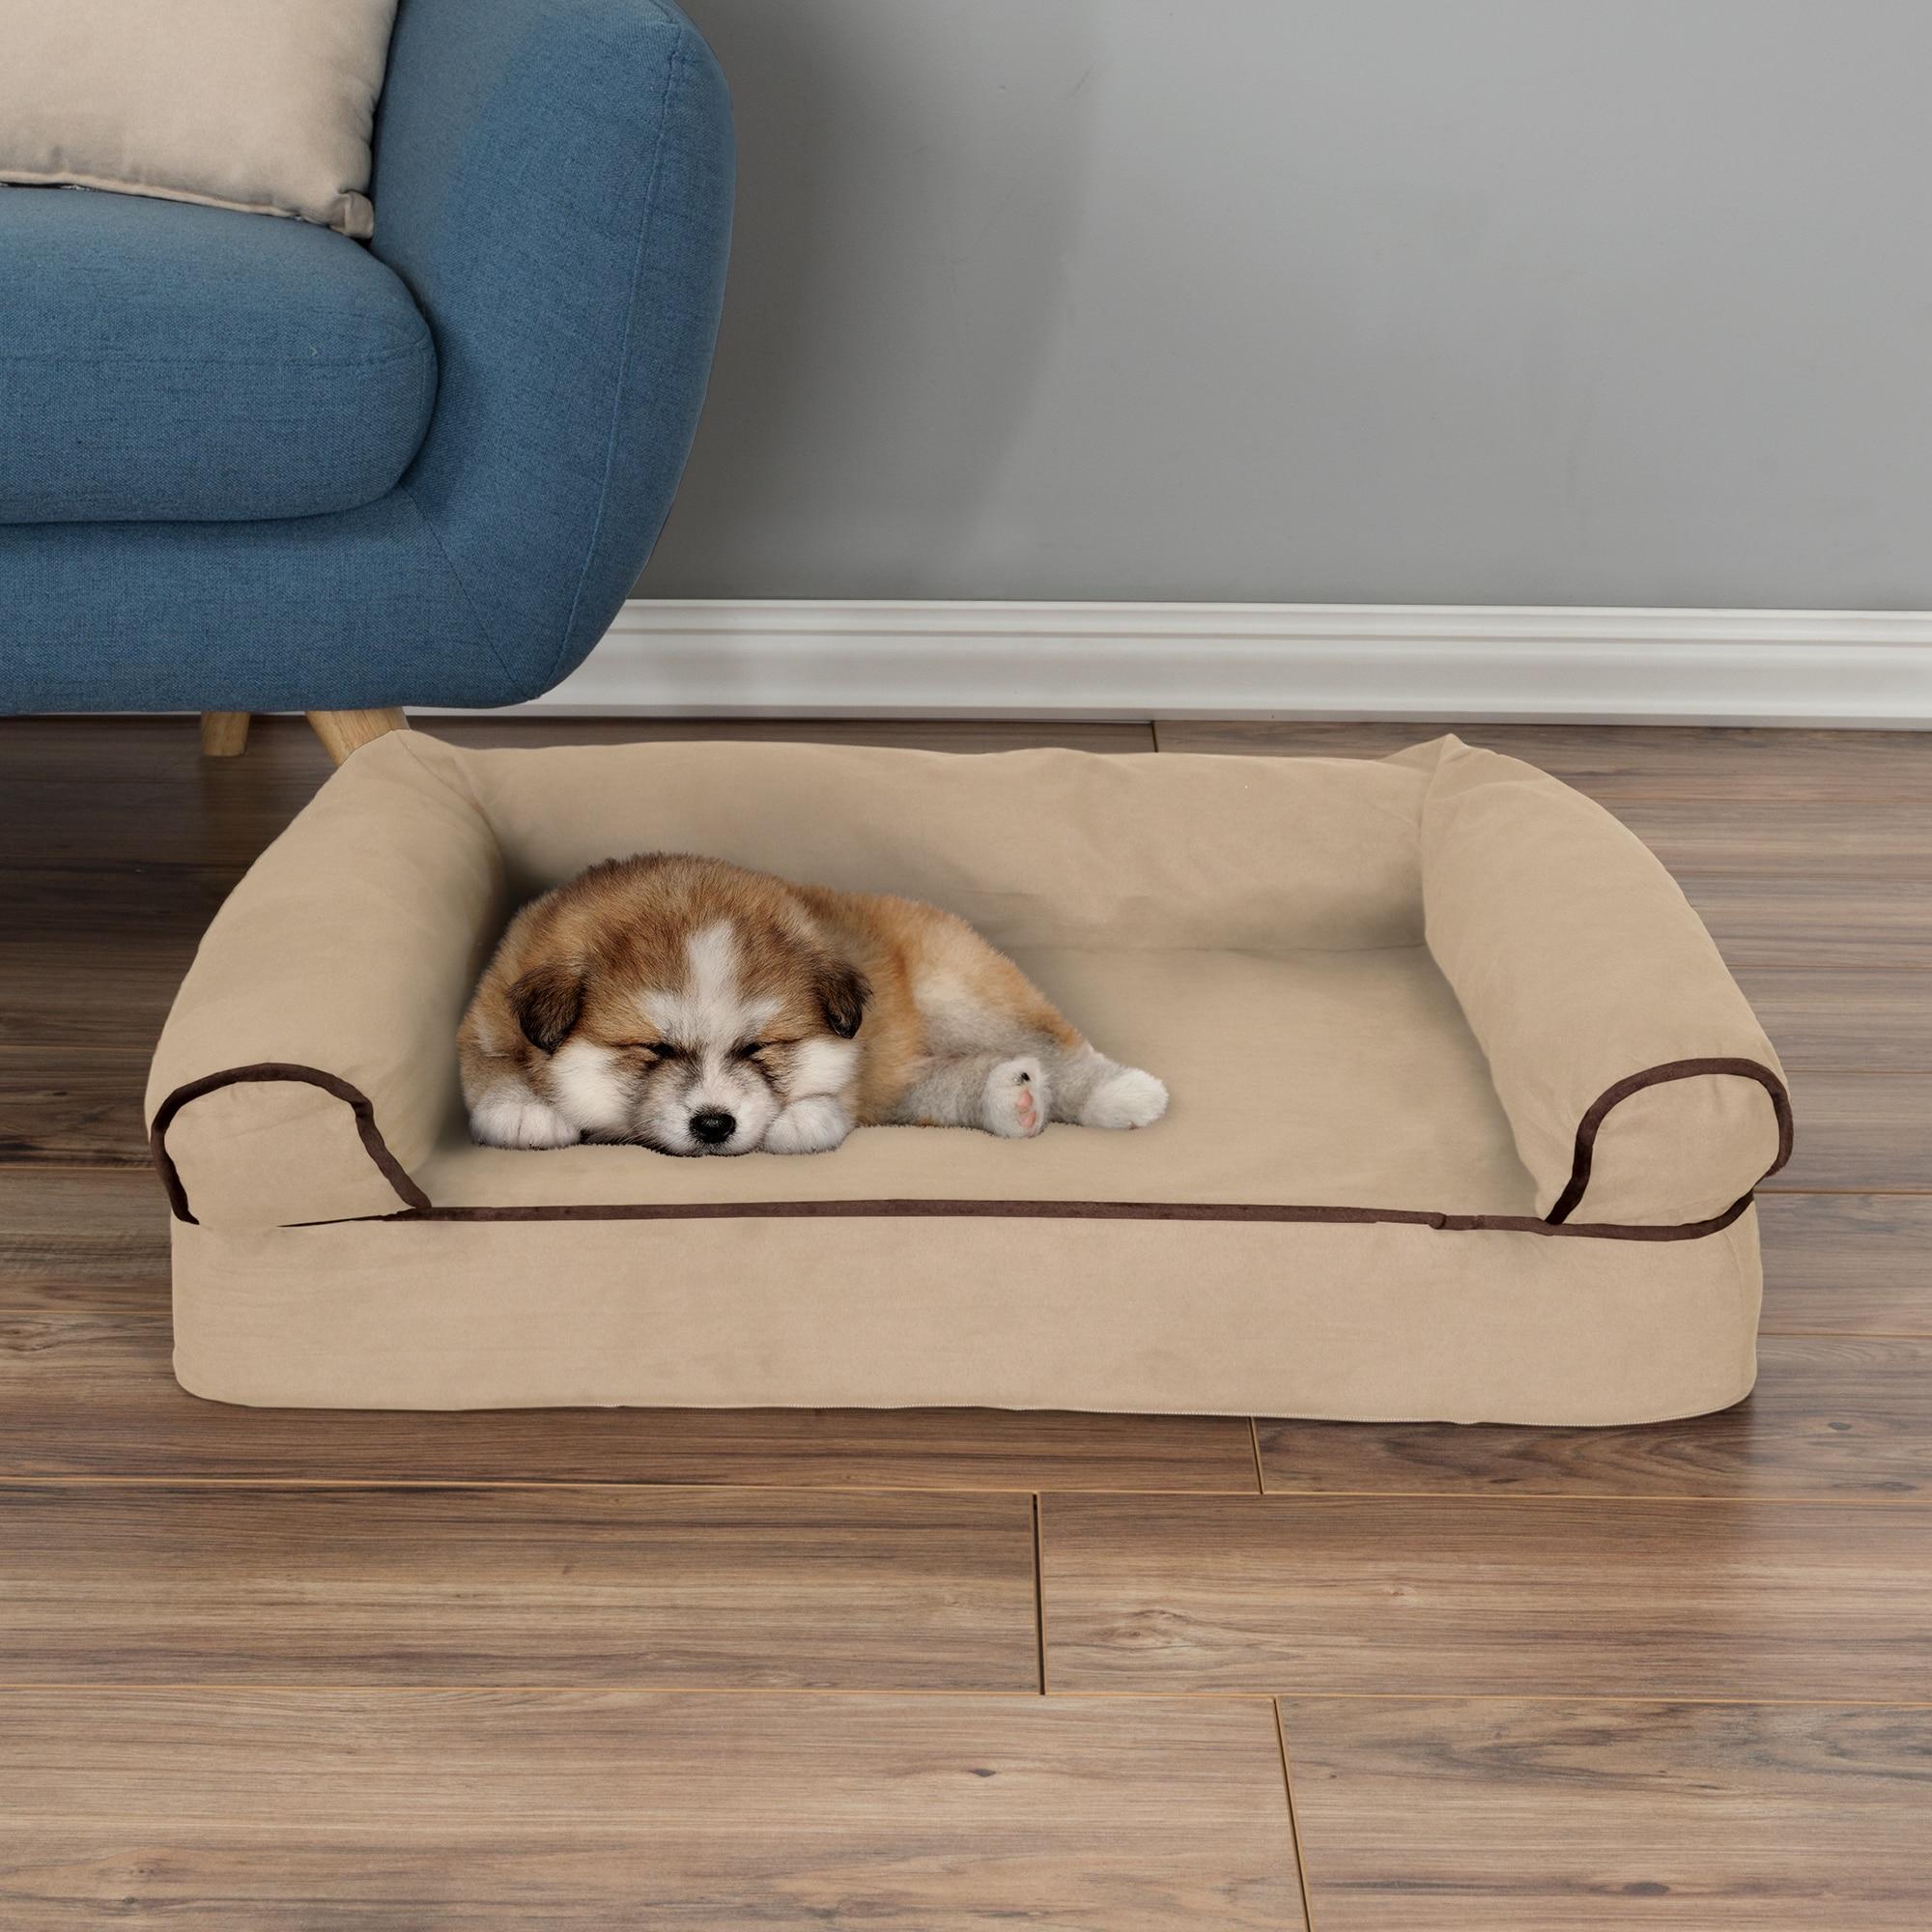 Petmaker Orthopedic Memory Foam Pet Bed Sofa On Free Shipping Orders Over 45 14659866